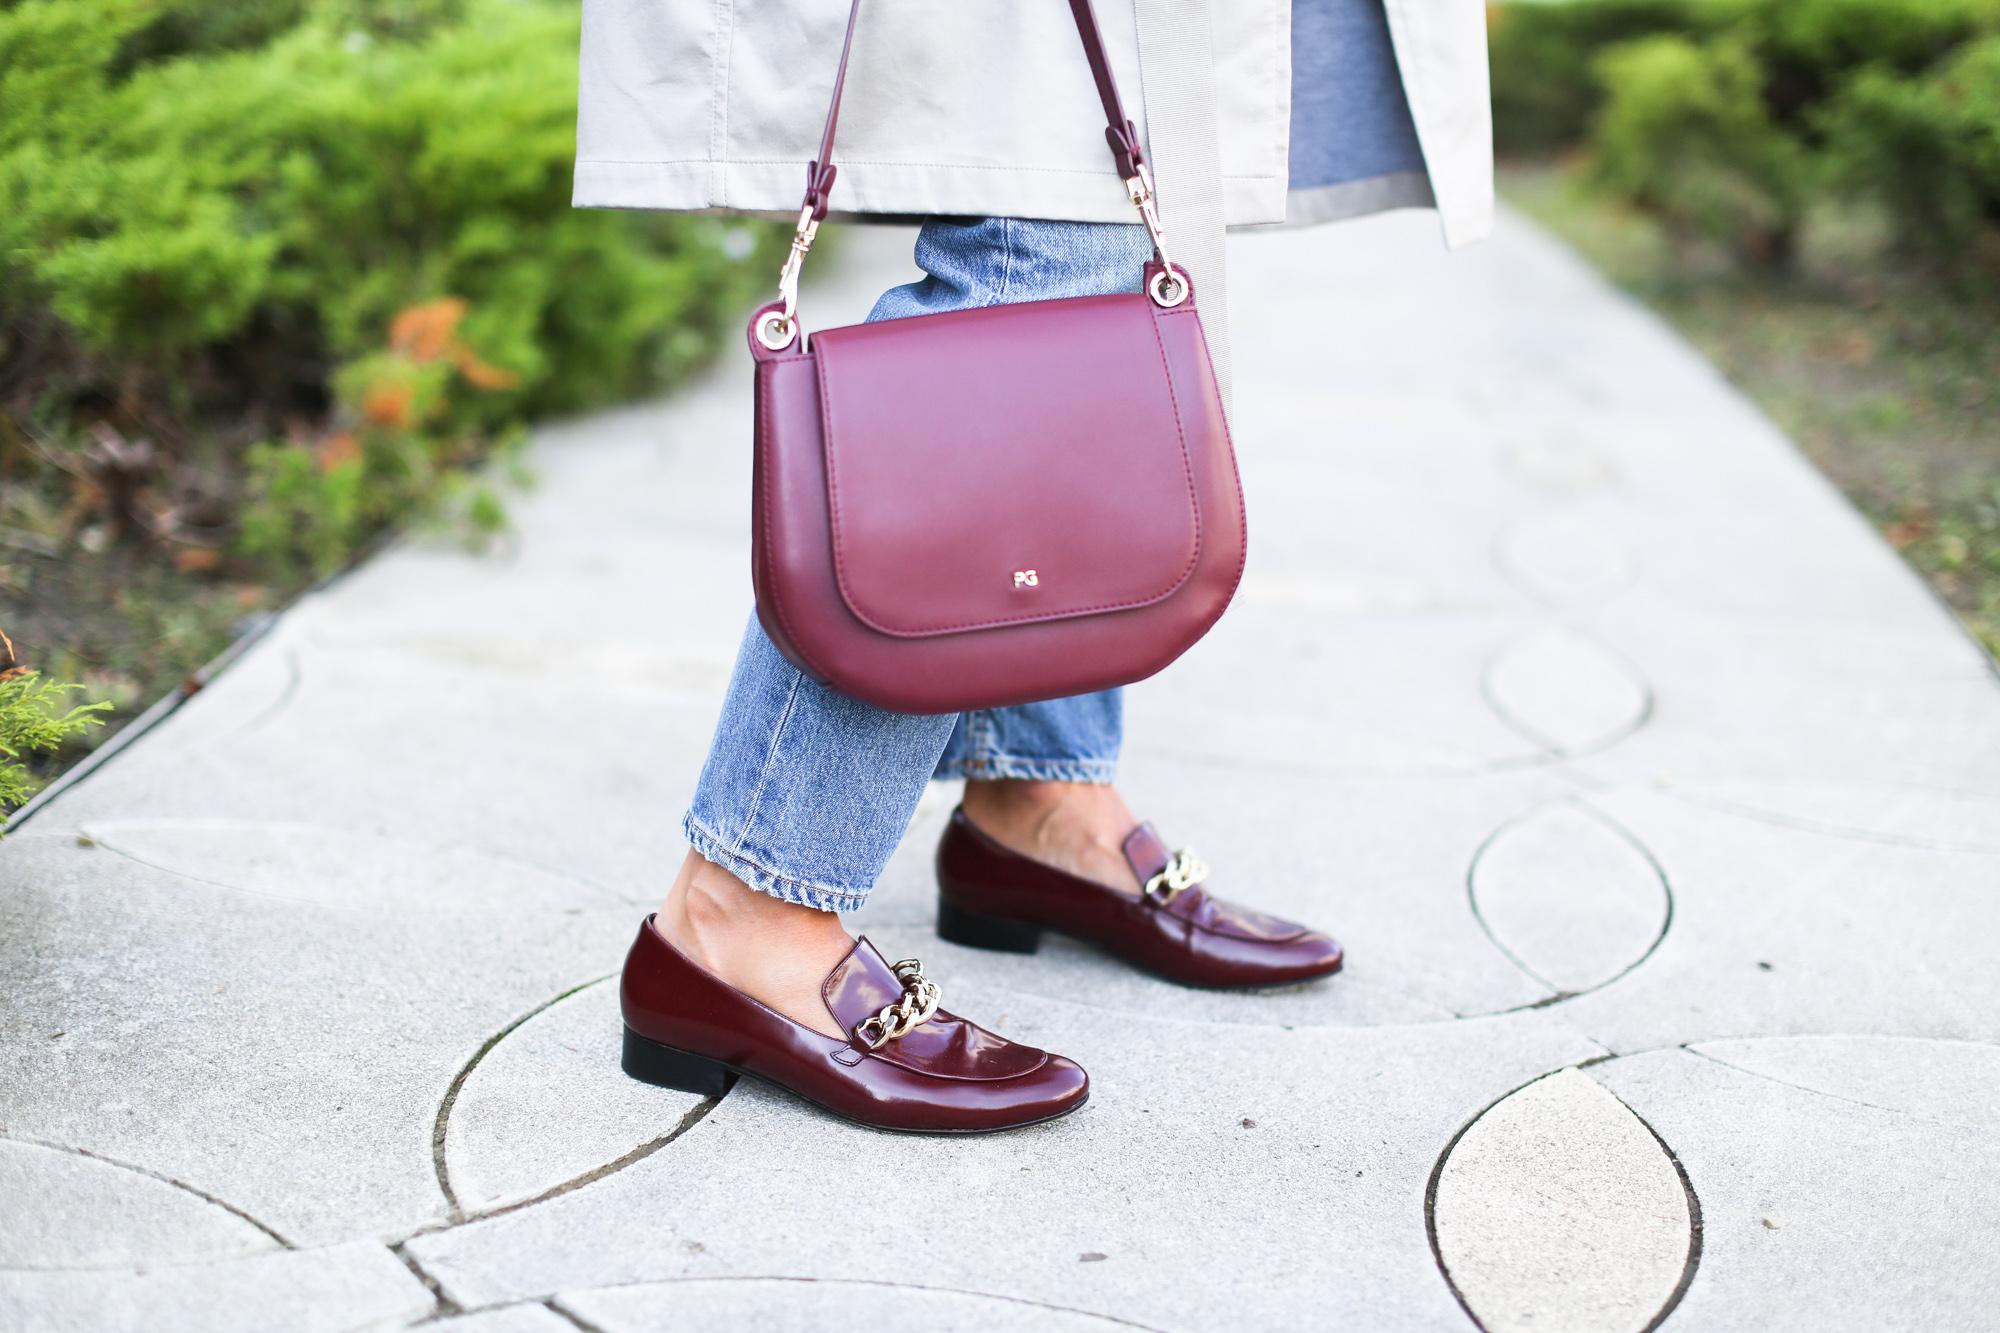 Clochet_streetstyle_fashionblogger_purificaciongarcia_pgbacktothecity_bandolerapielwestfalia_mocasinespielgranates-7